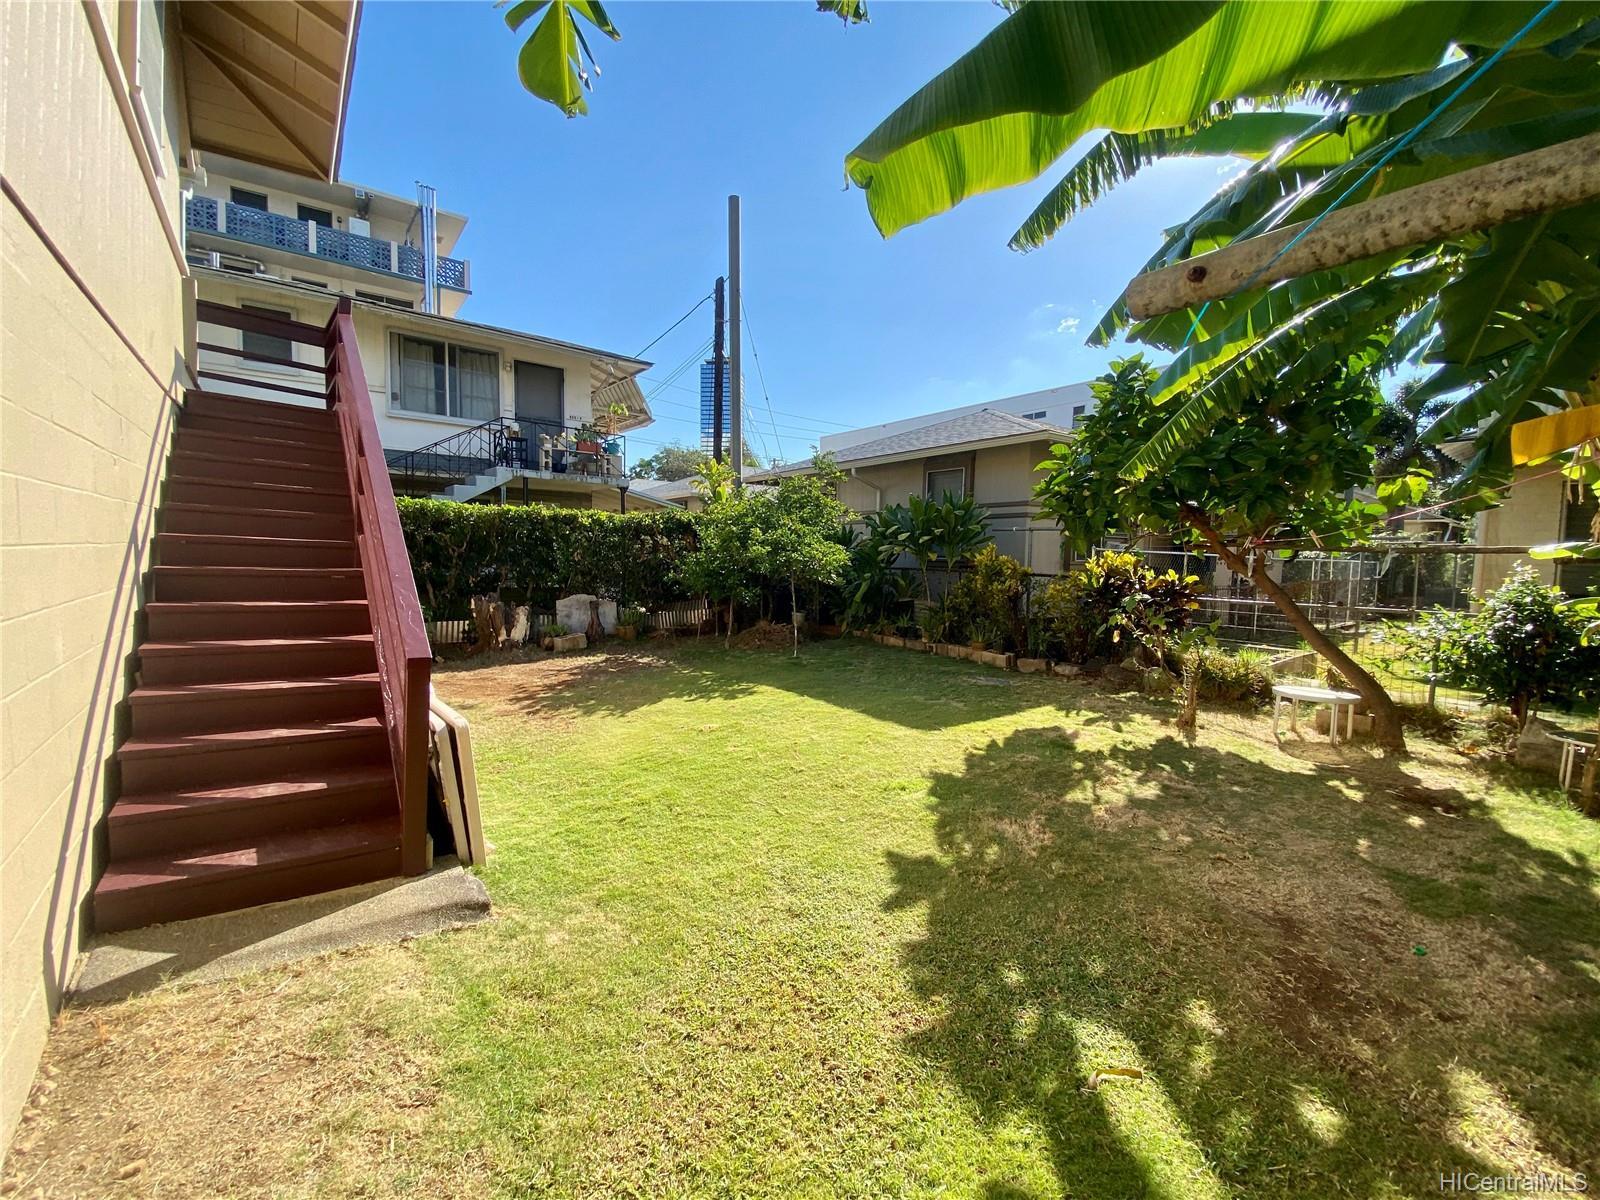 834 Pumehana Street Honolulu - Multi-family - photo 6 of 8